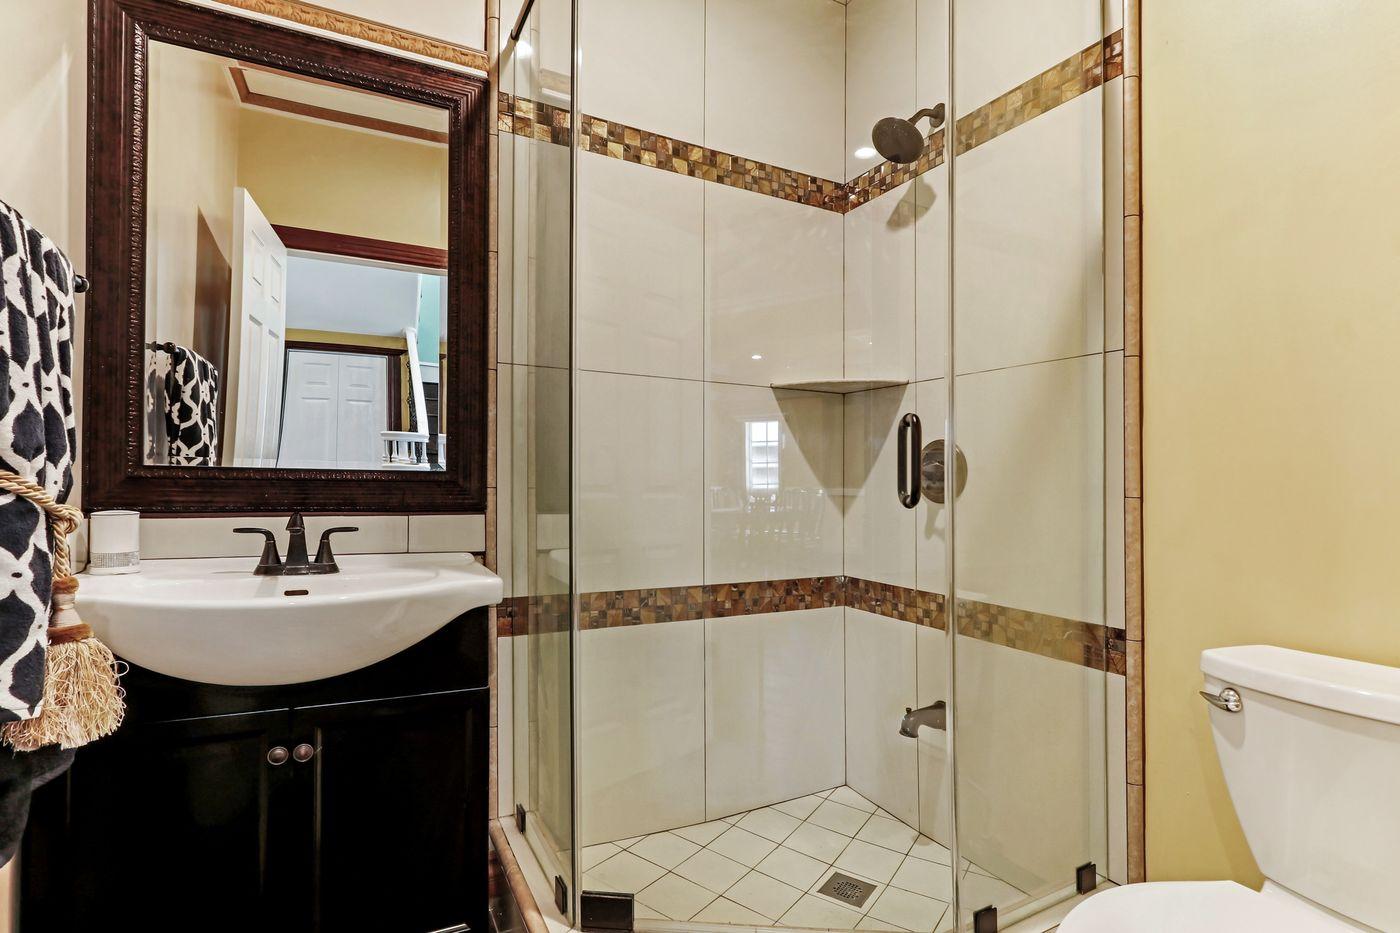 real-estate-photography-los-angeles-pasadena-glendale-burbank-AD-photographer-7